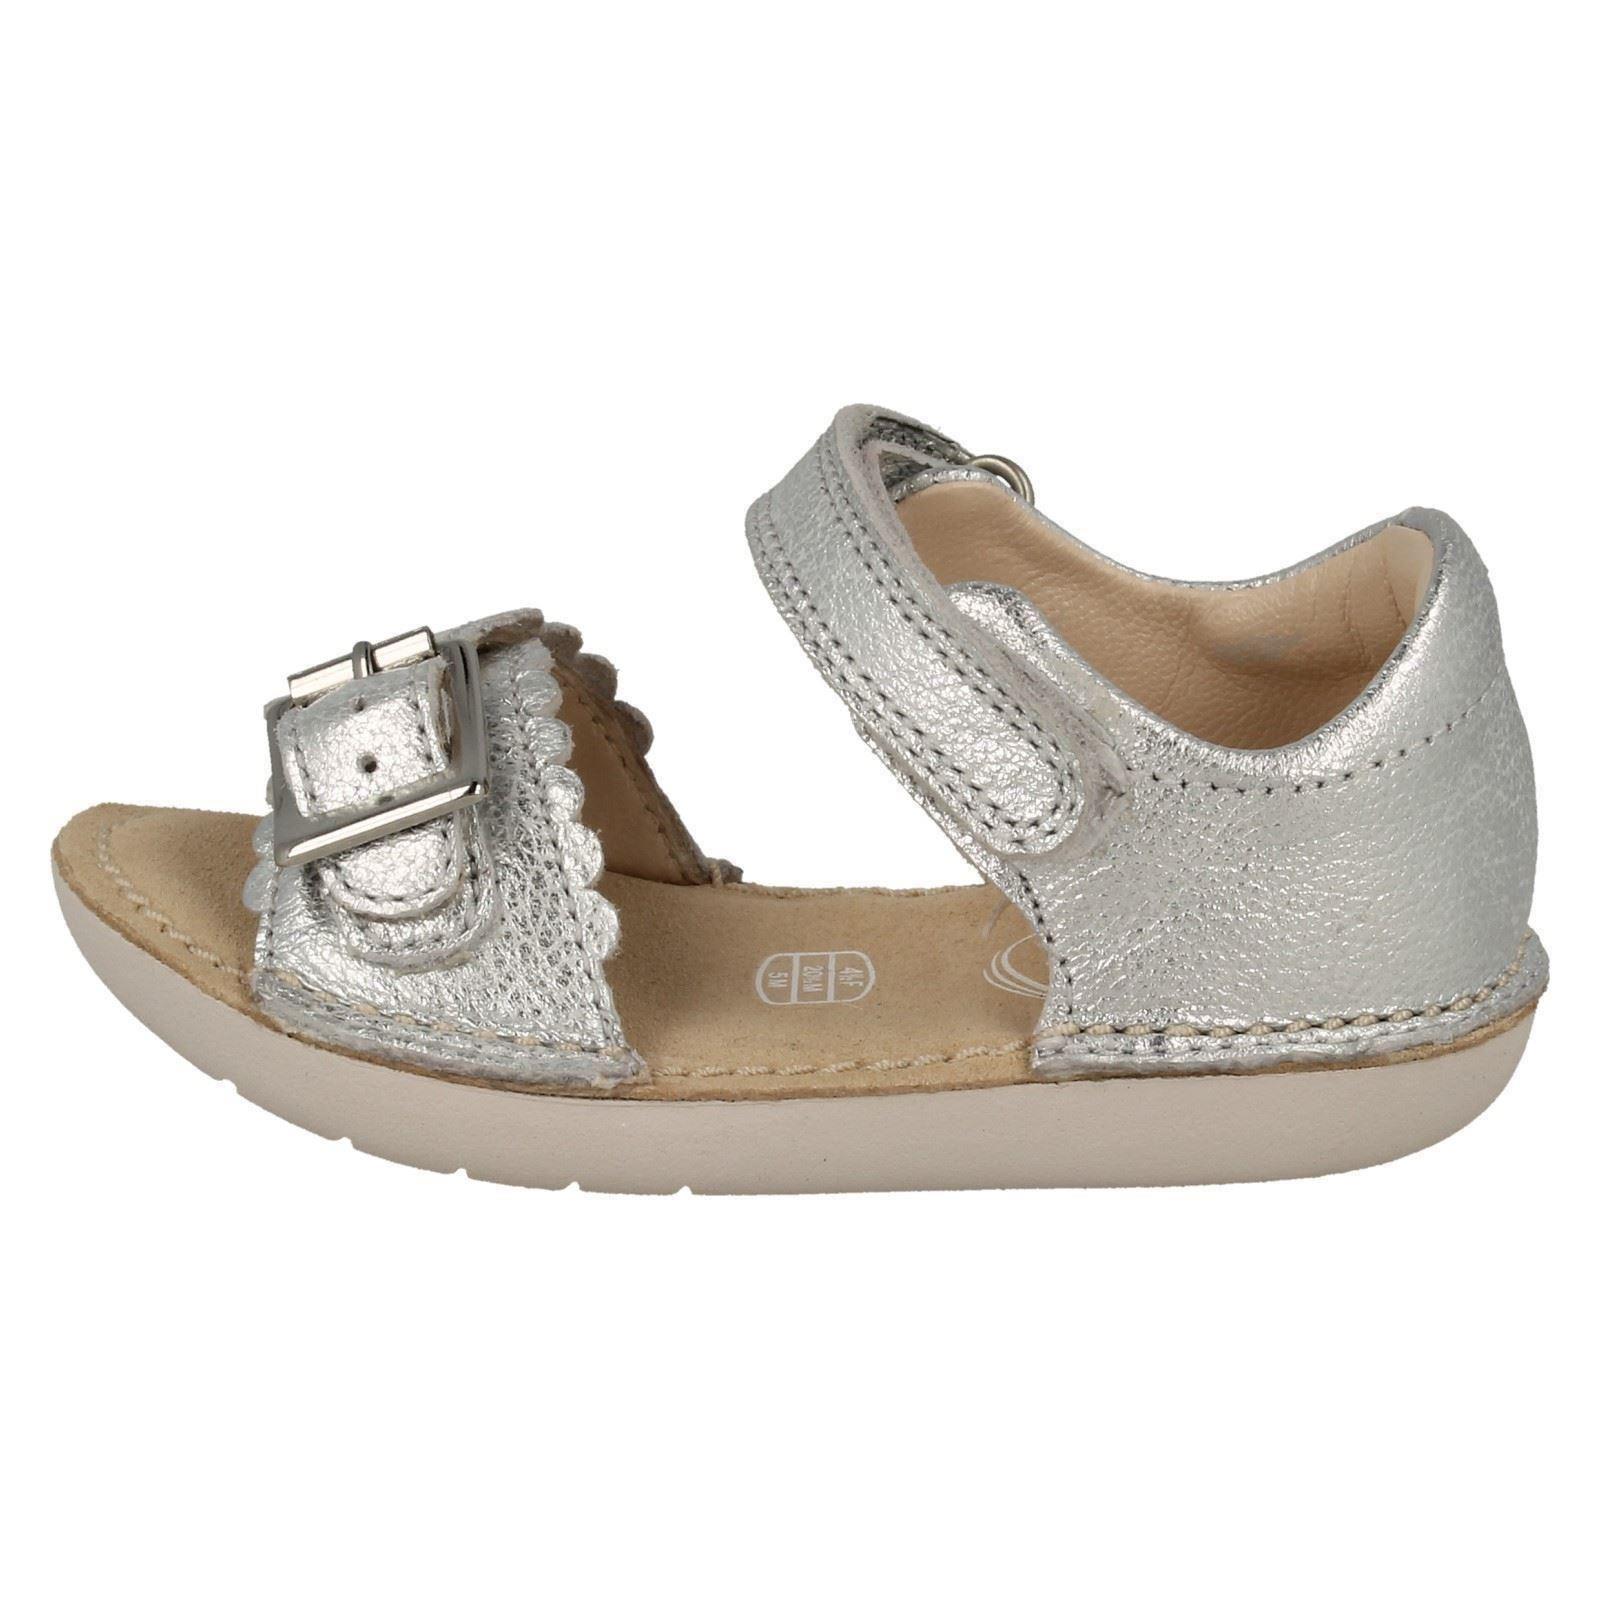 a11a91c8f07 Clarks Ivy Flora Girls First Sandal UK 4.5 Infant Silver F